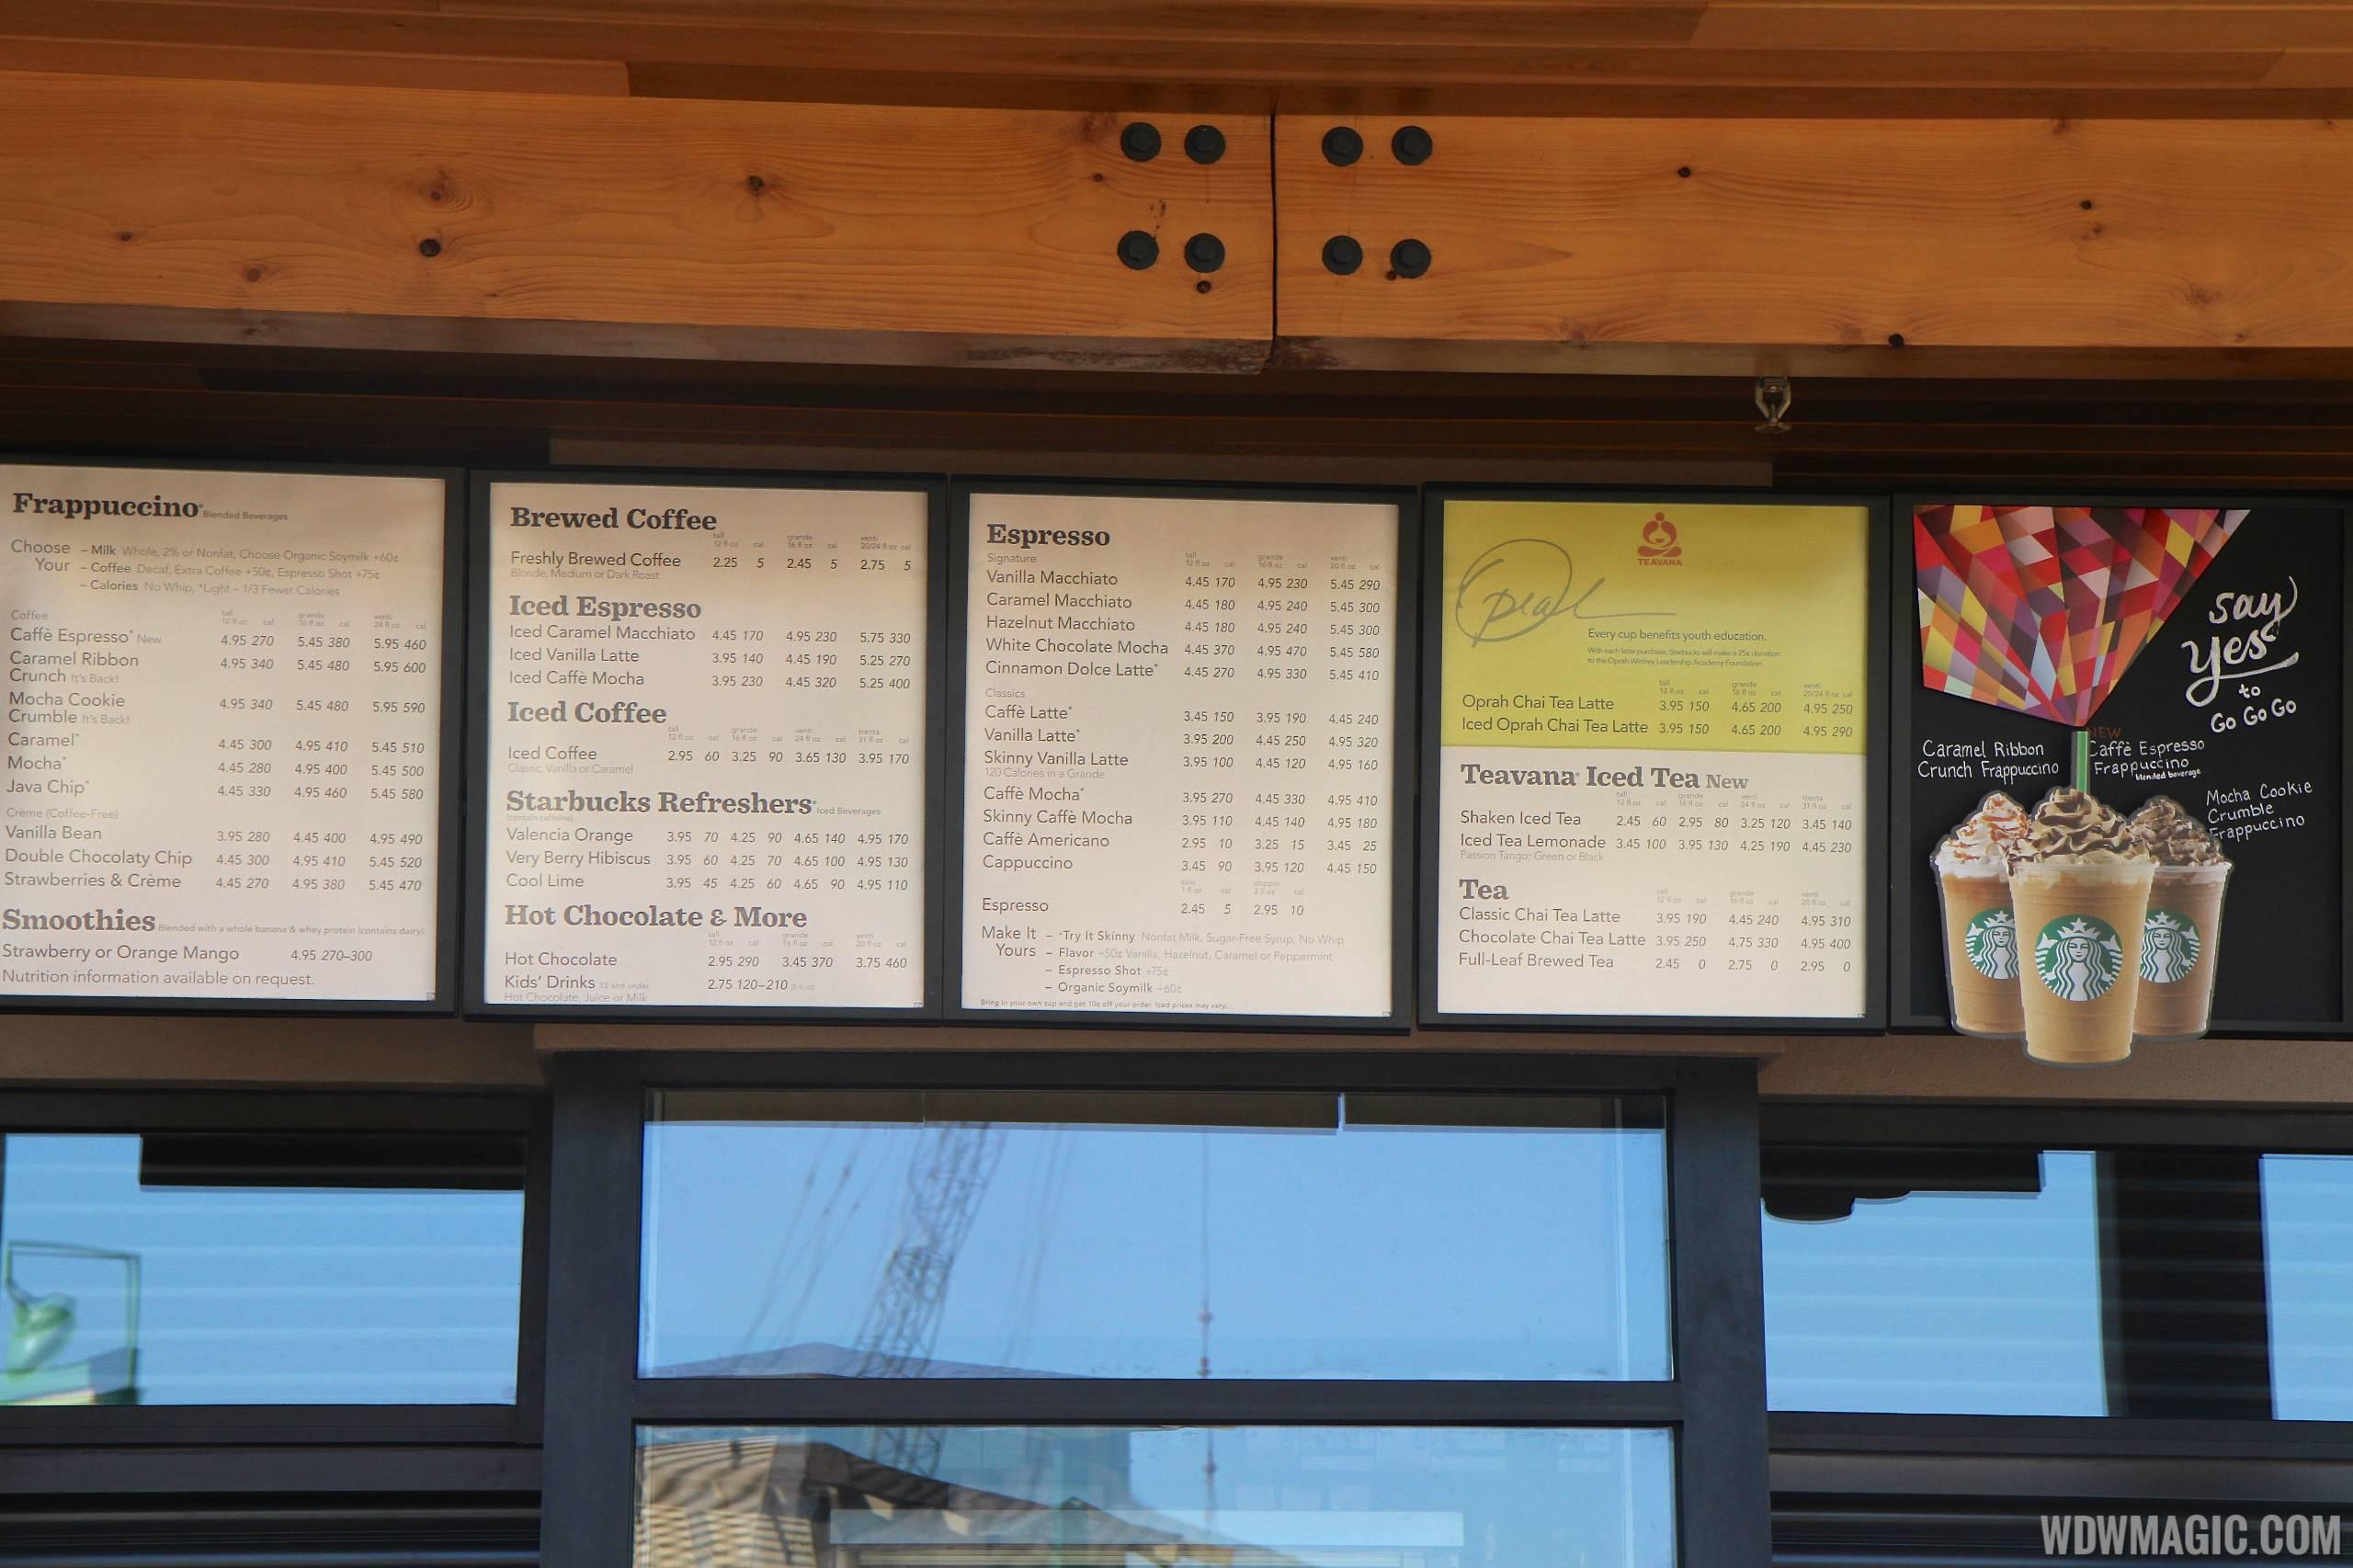 Starbucks Marketplace menu